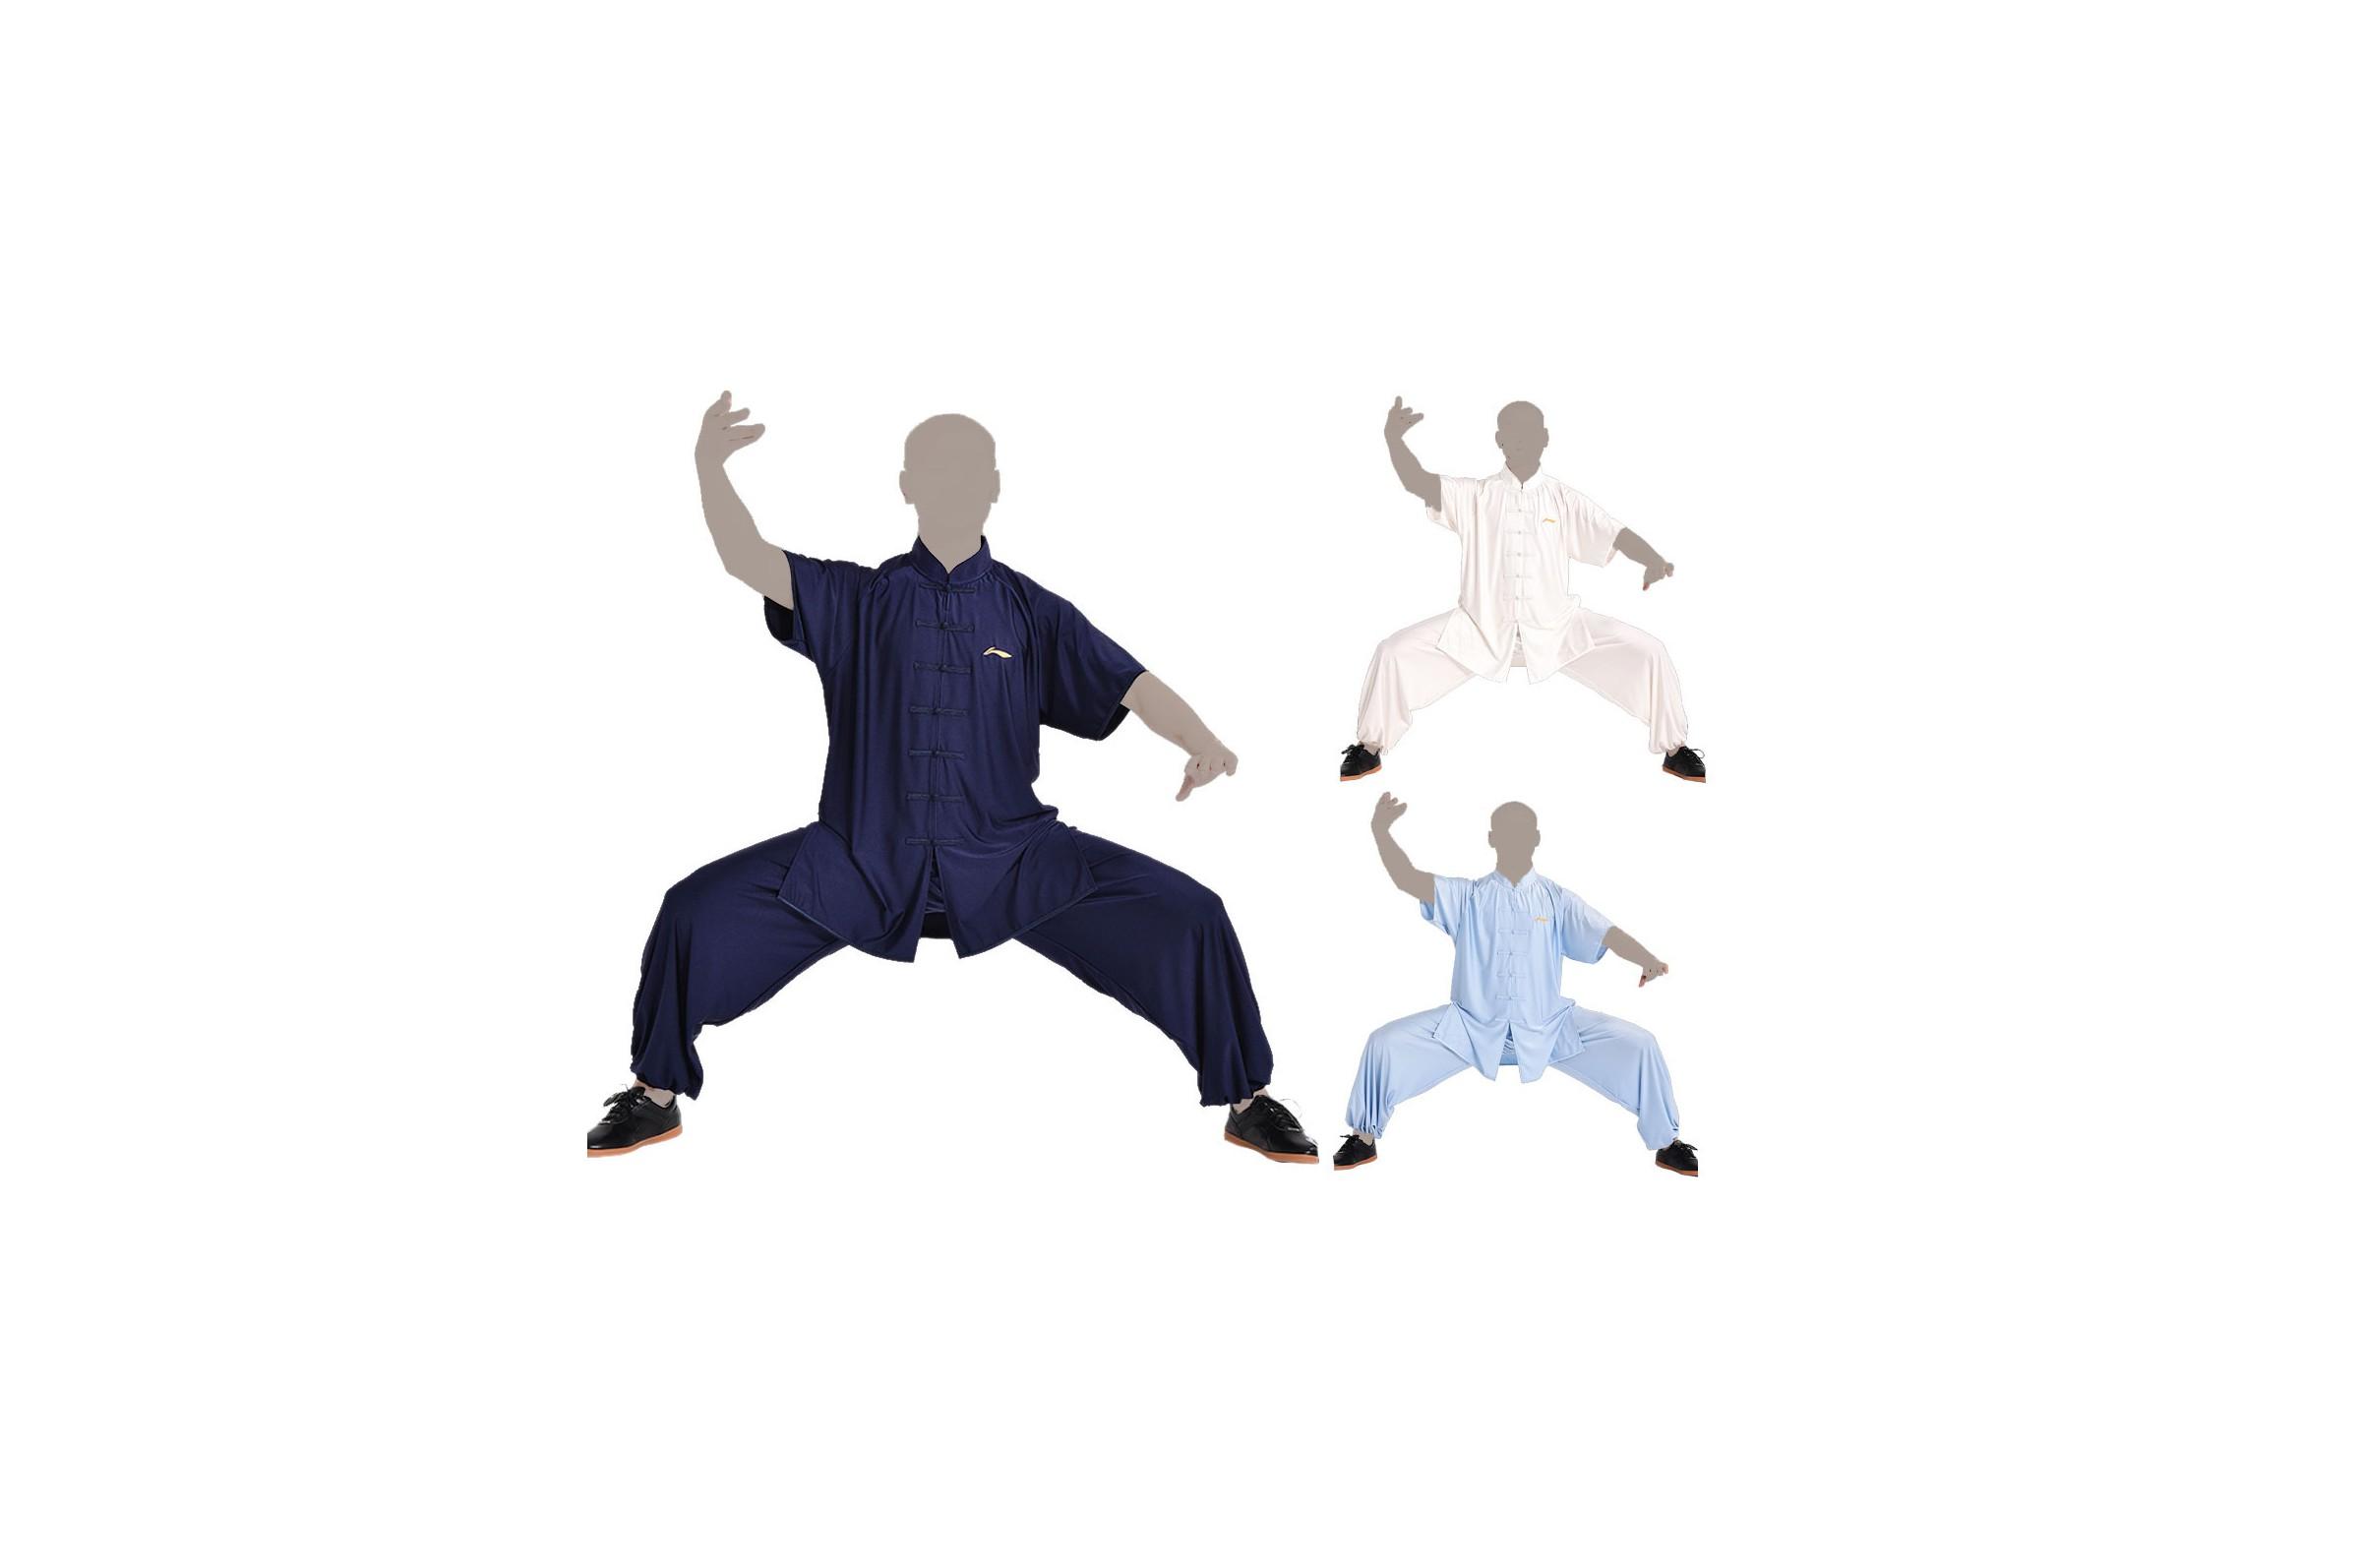 Tenue Chang Quan Haut de Gamme, Lining